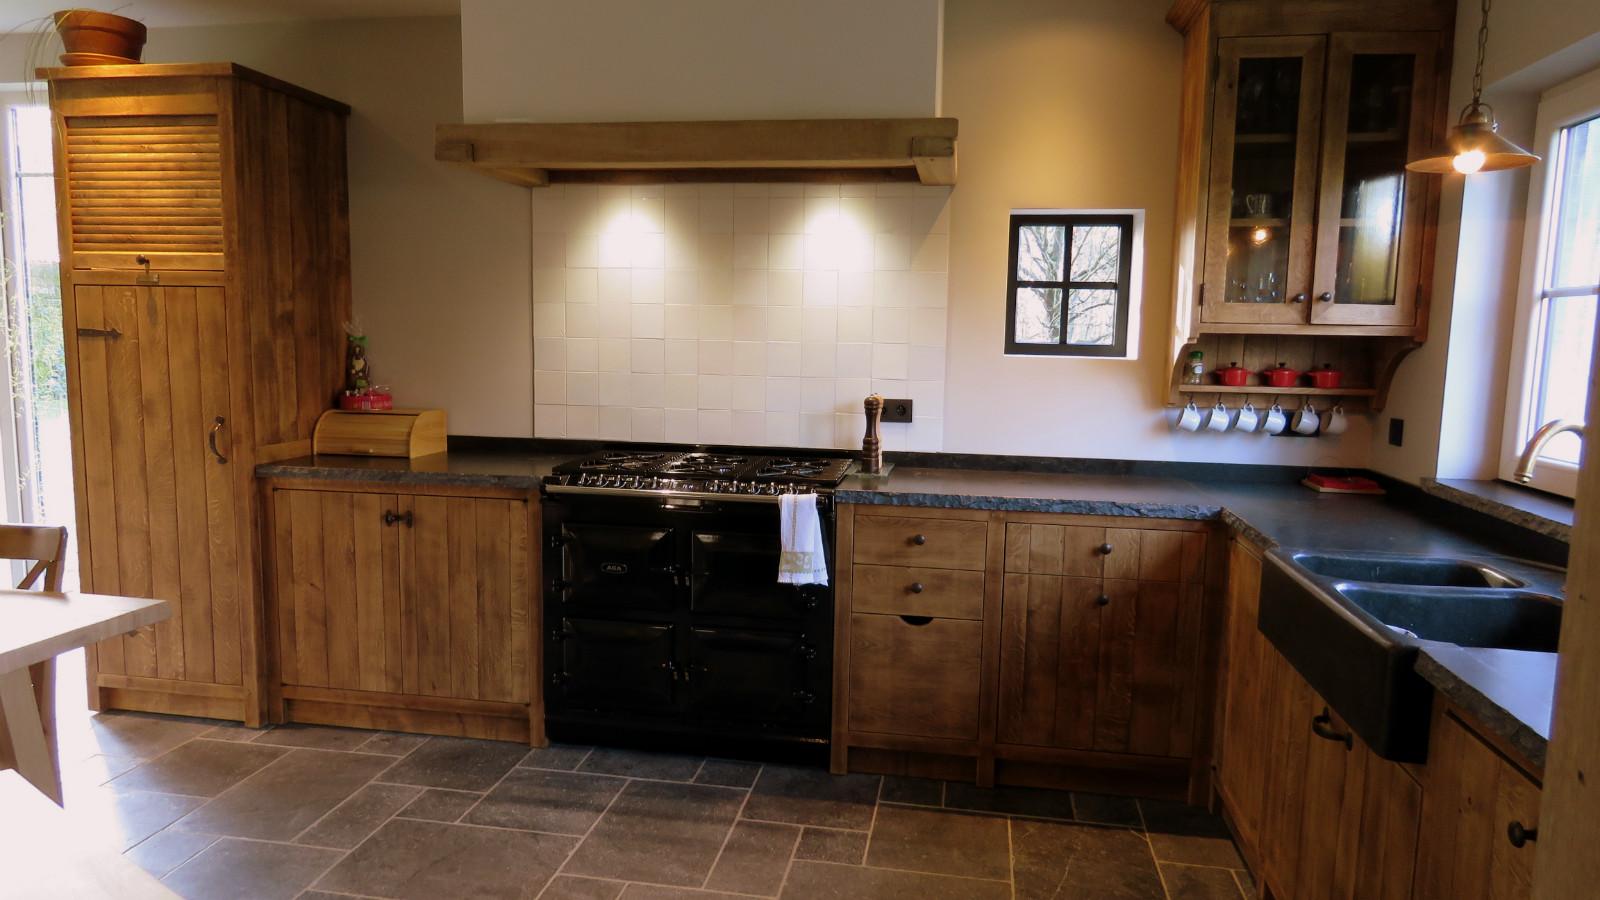 Landelijke keuken in massief eik - vb 4 - Keukens - Arthur Bours